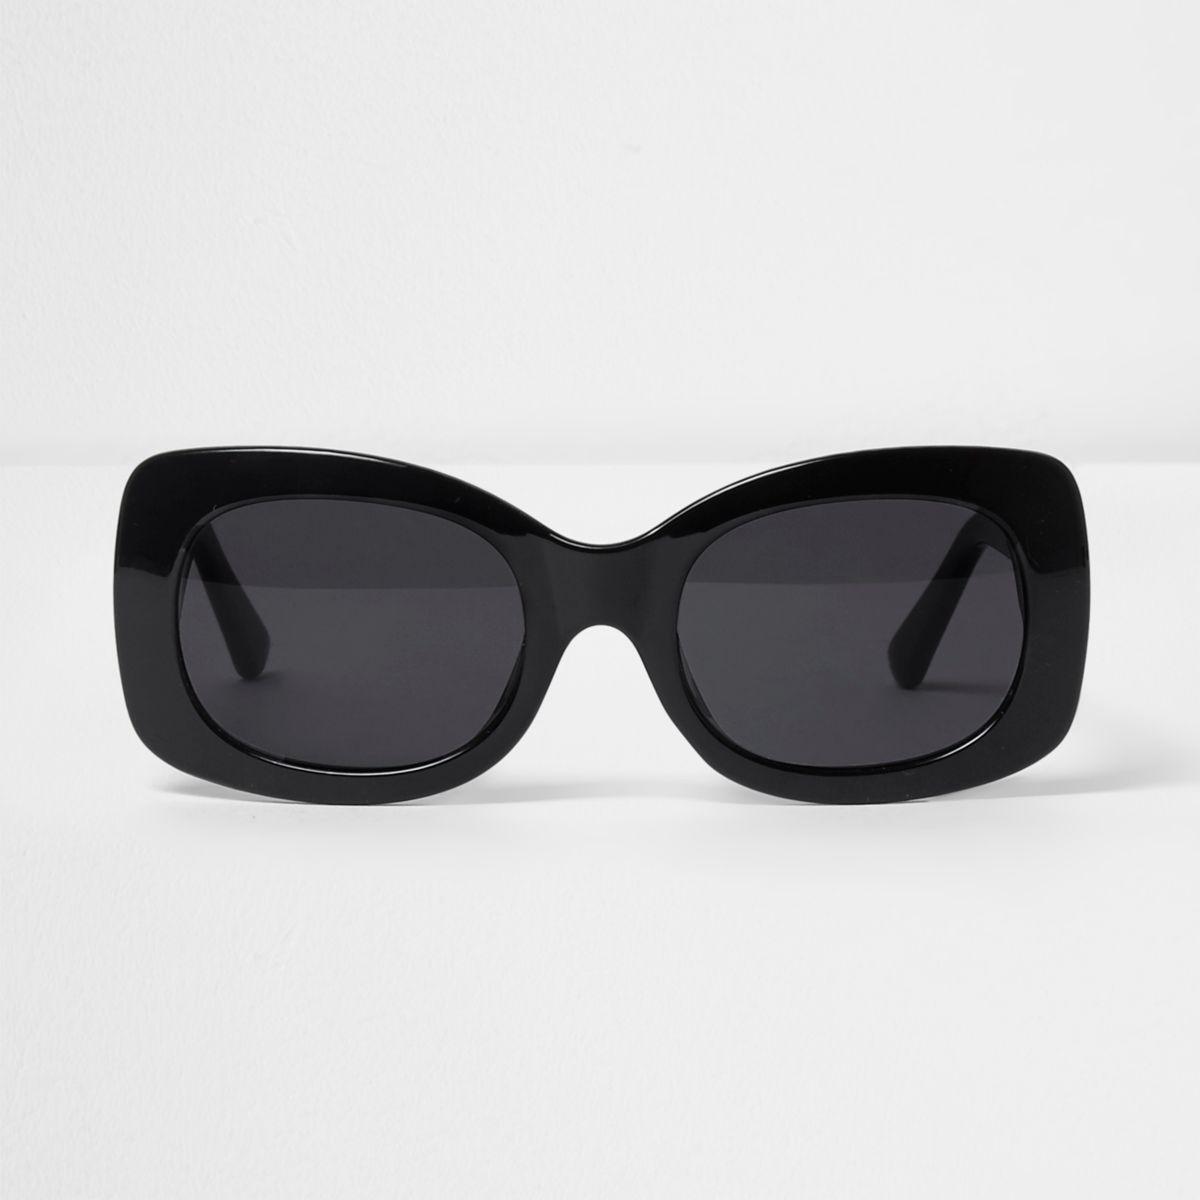 River Island Black Square Smoke Lense Glam Sunglasses in Black - Lyst f66b6d77a7